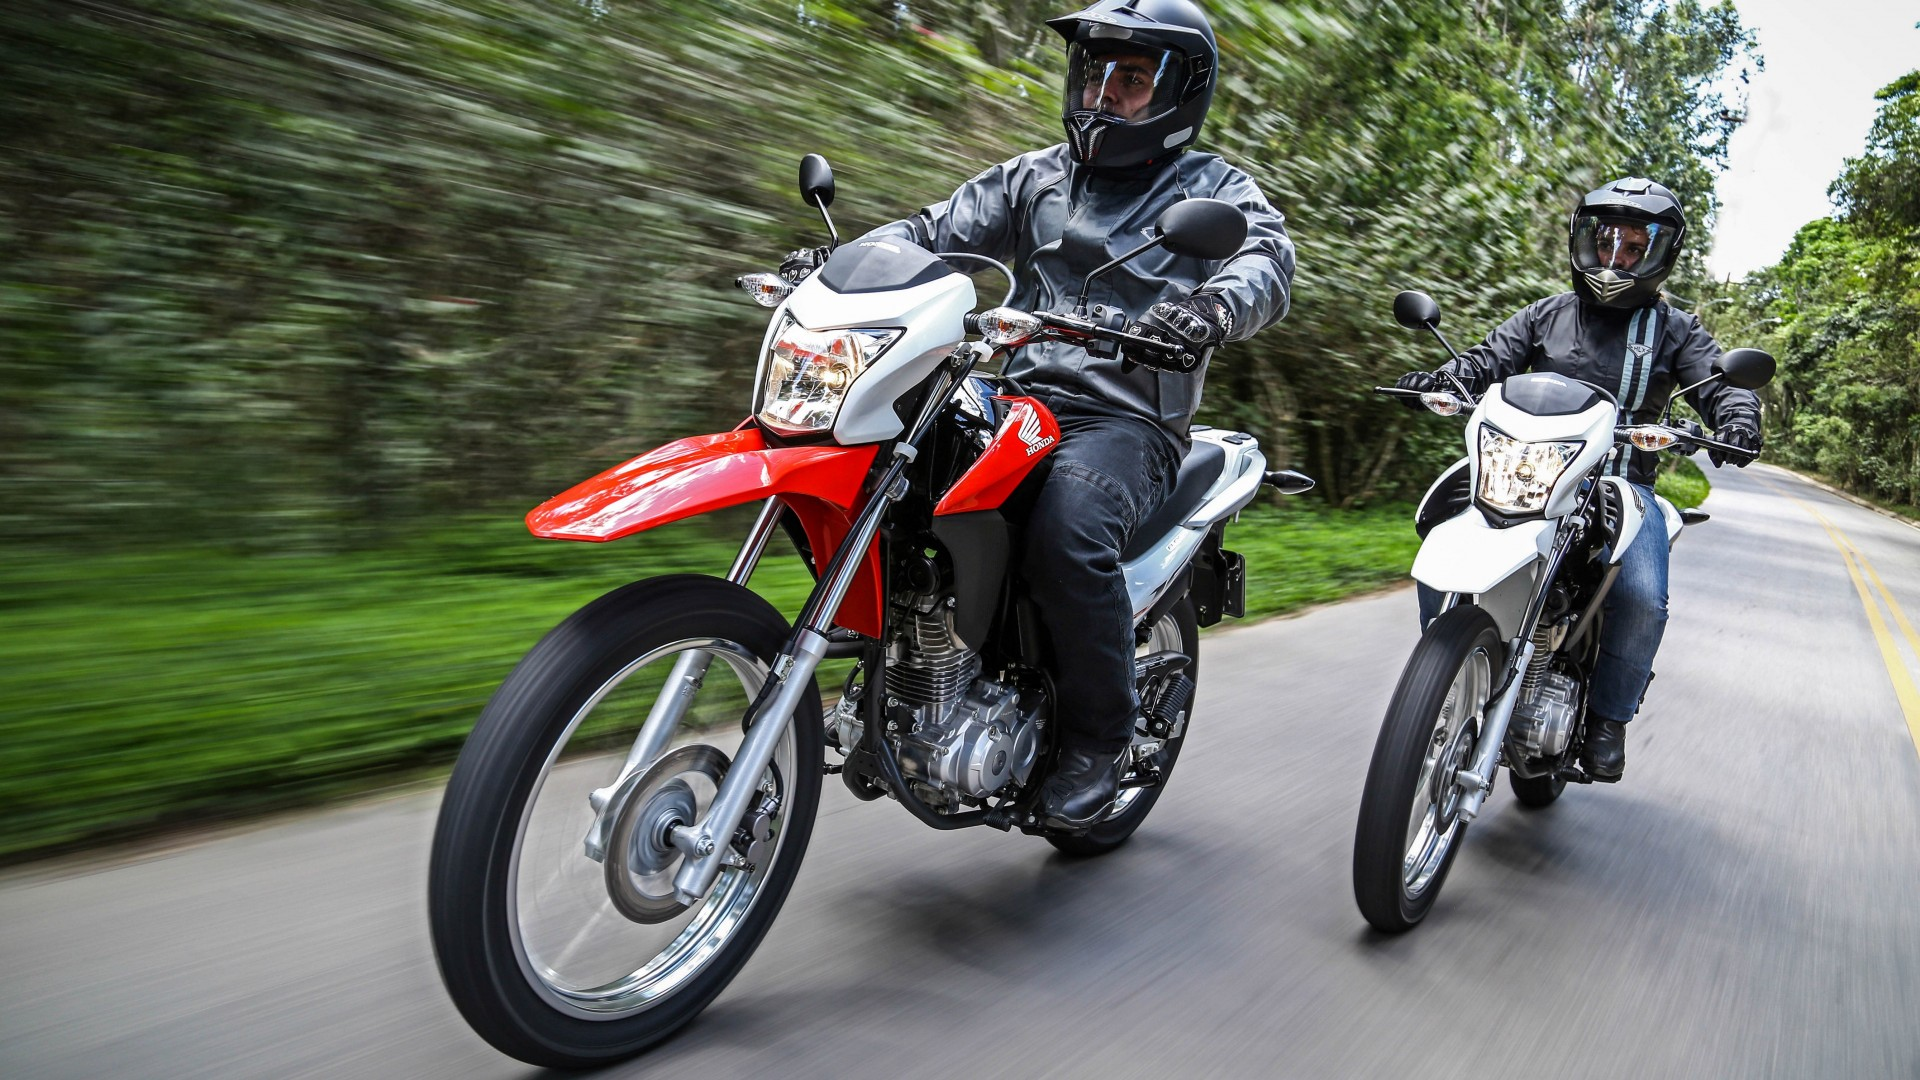 Wallpaper Honda Bros 160 MXR 160 Best Bikes 2015 motorcycle 1920x1080